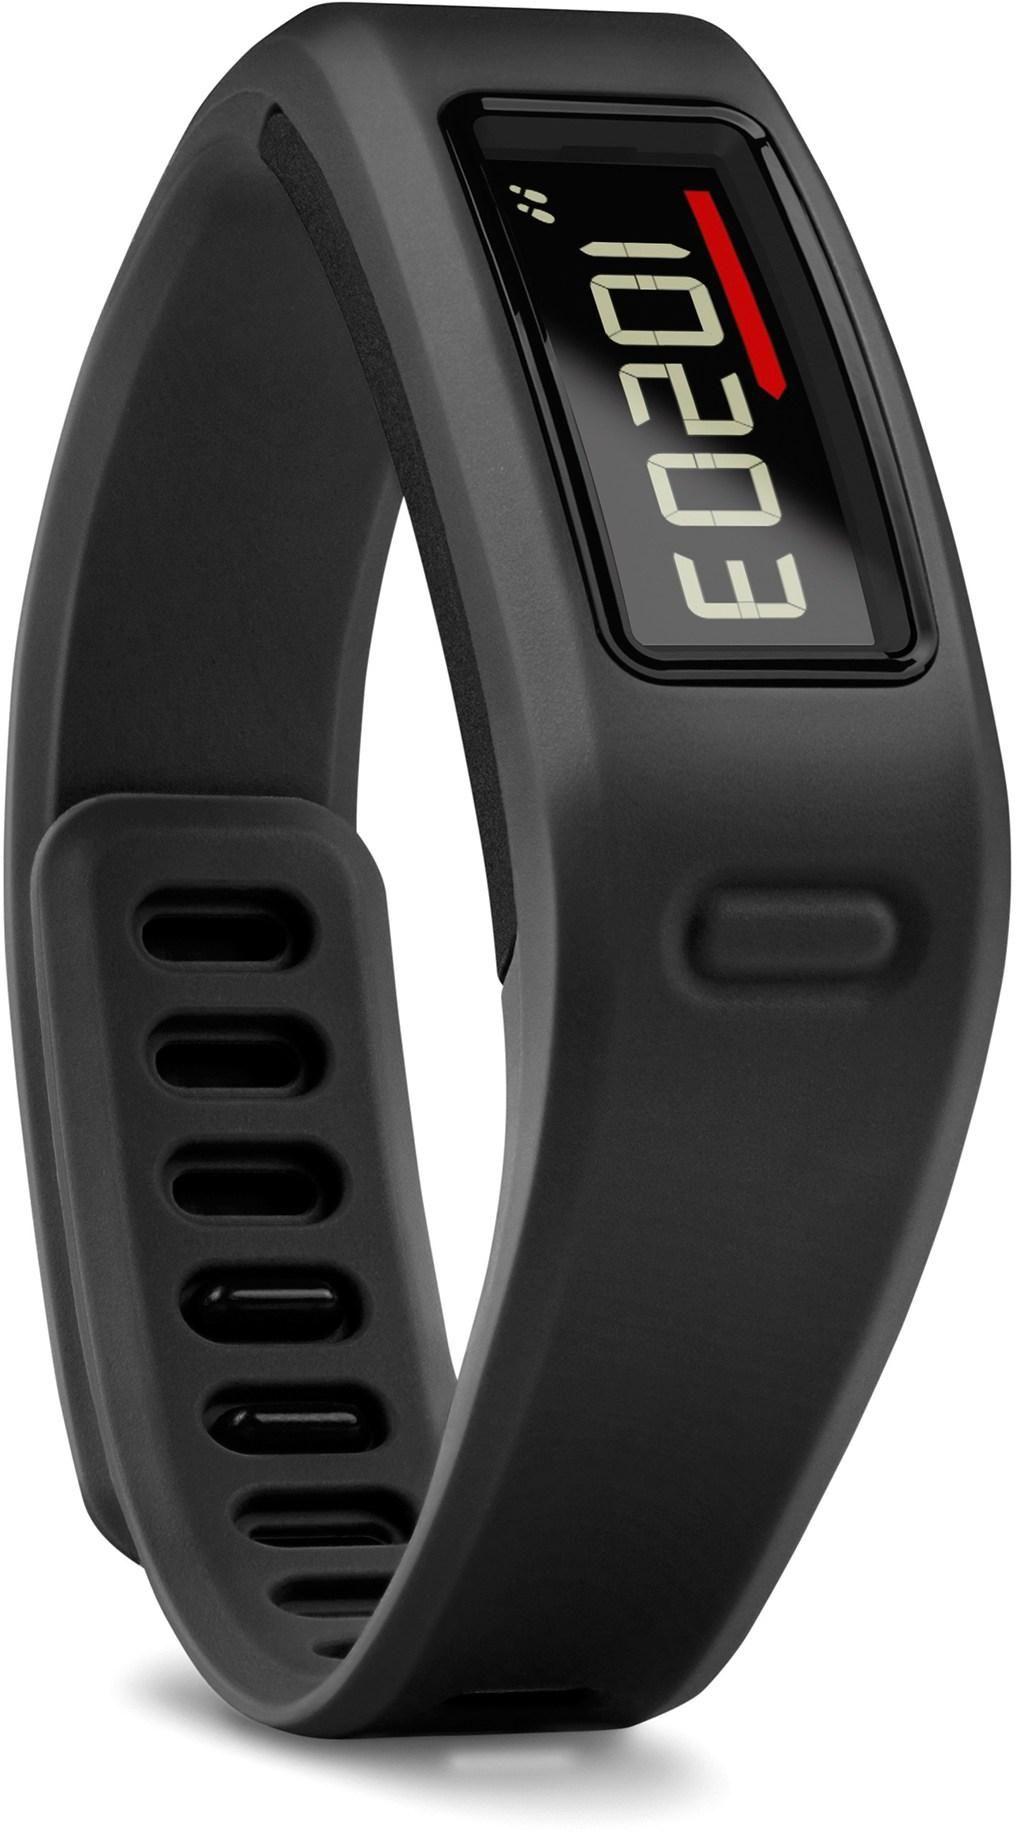 Garmin Vivofit Wireless Activity Tracker Rei Co Op Garmin Fitness Tracker Band Workout Garmin Vivofit